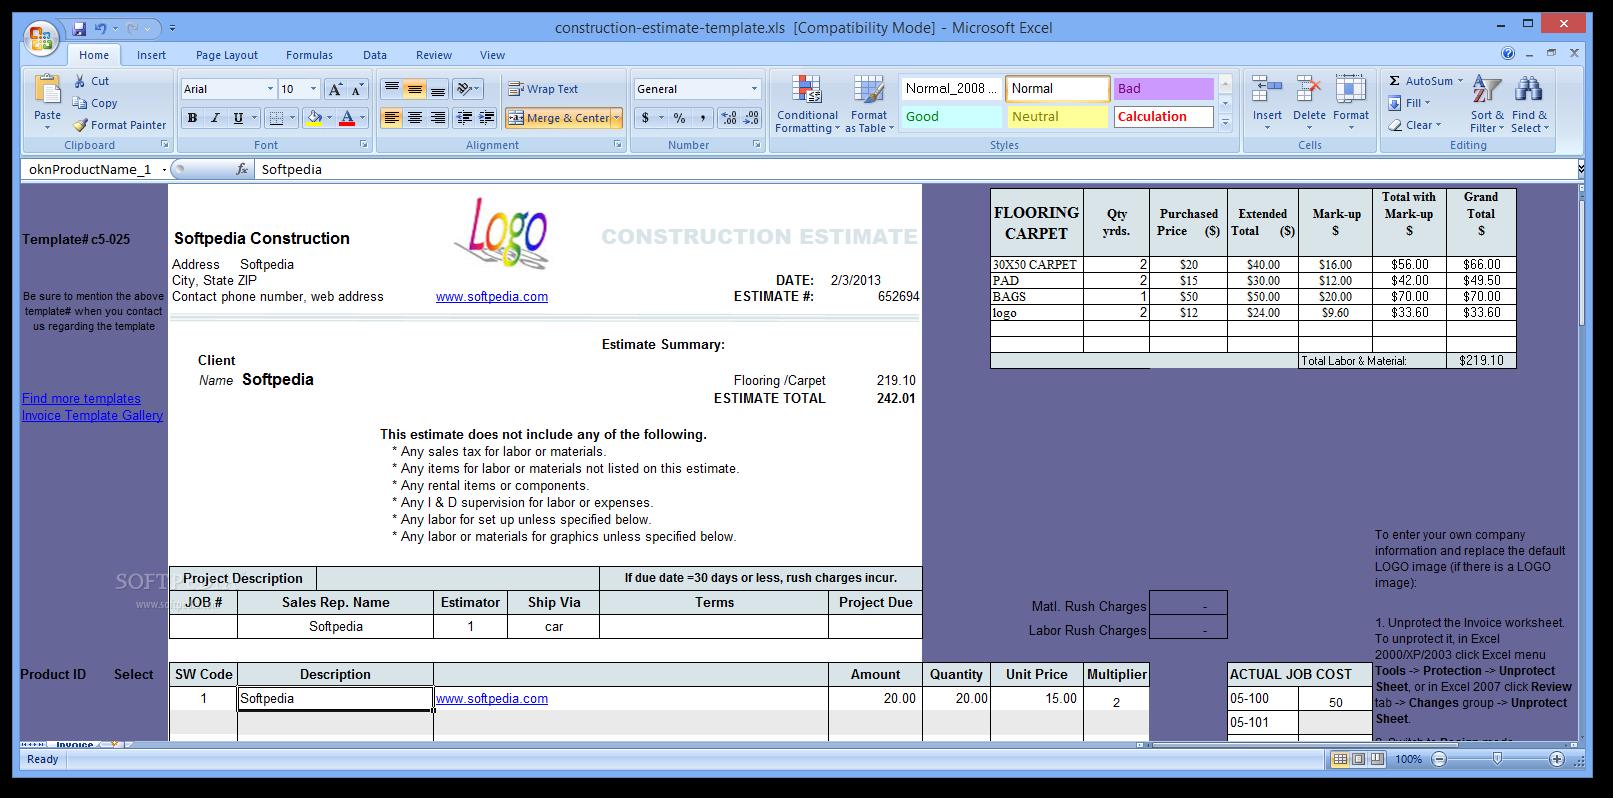 download construction estimate template